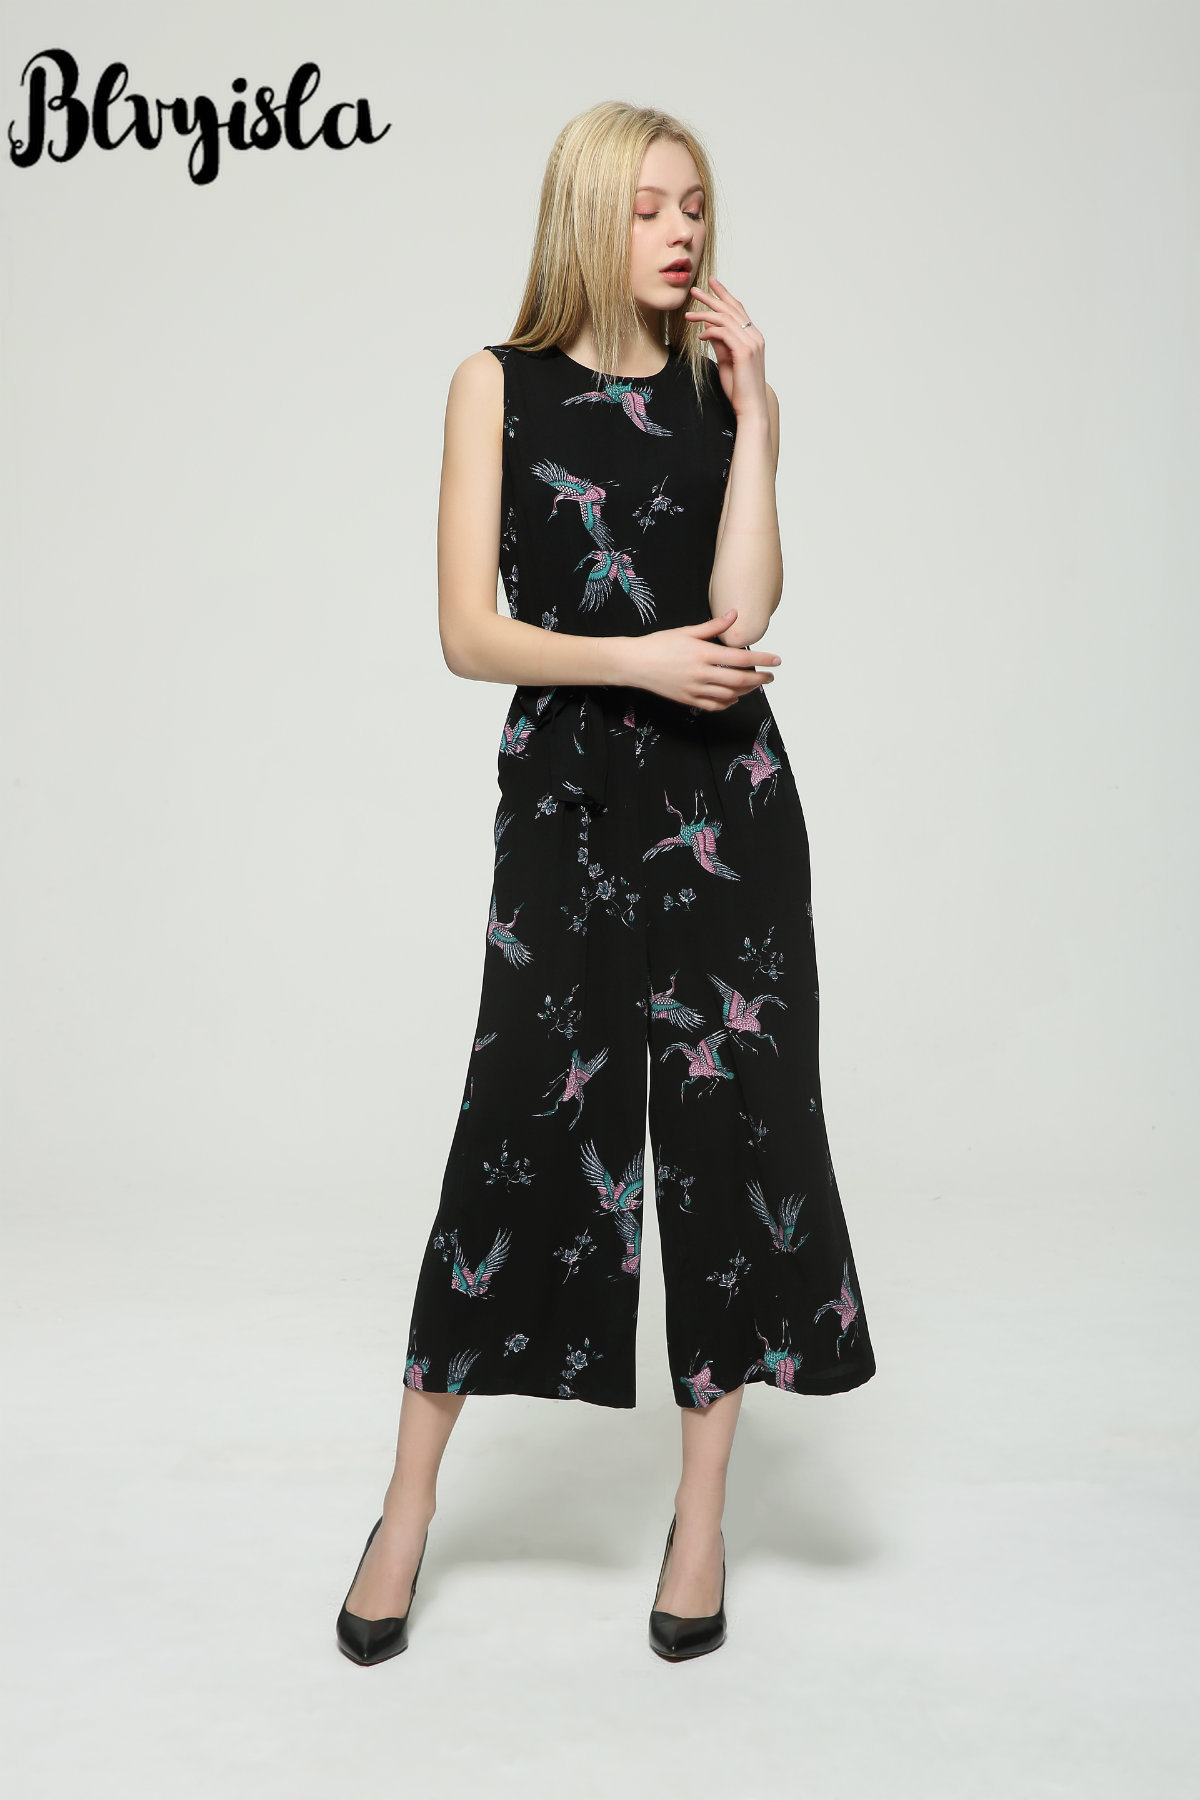 Sexy Bodysuit Chiffon Women Sleeveless Summer Black Printed Blvyisla Office Jumpsuit Lady Playsuits Overalls Long fCwnWFq